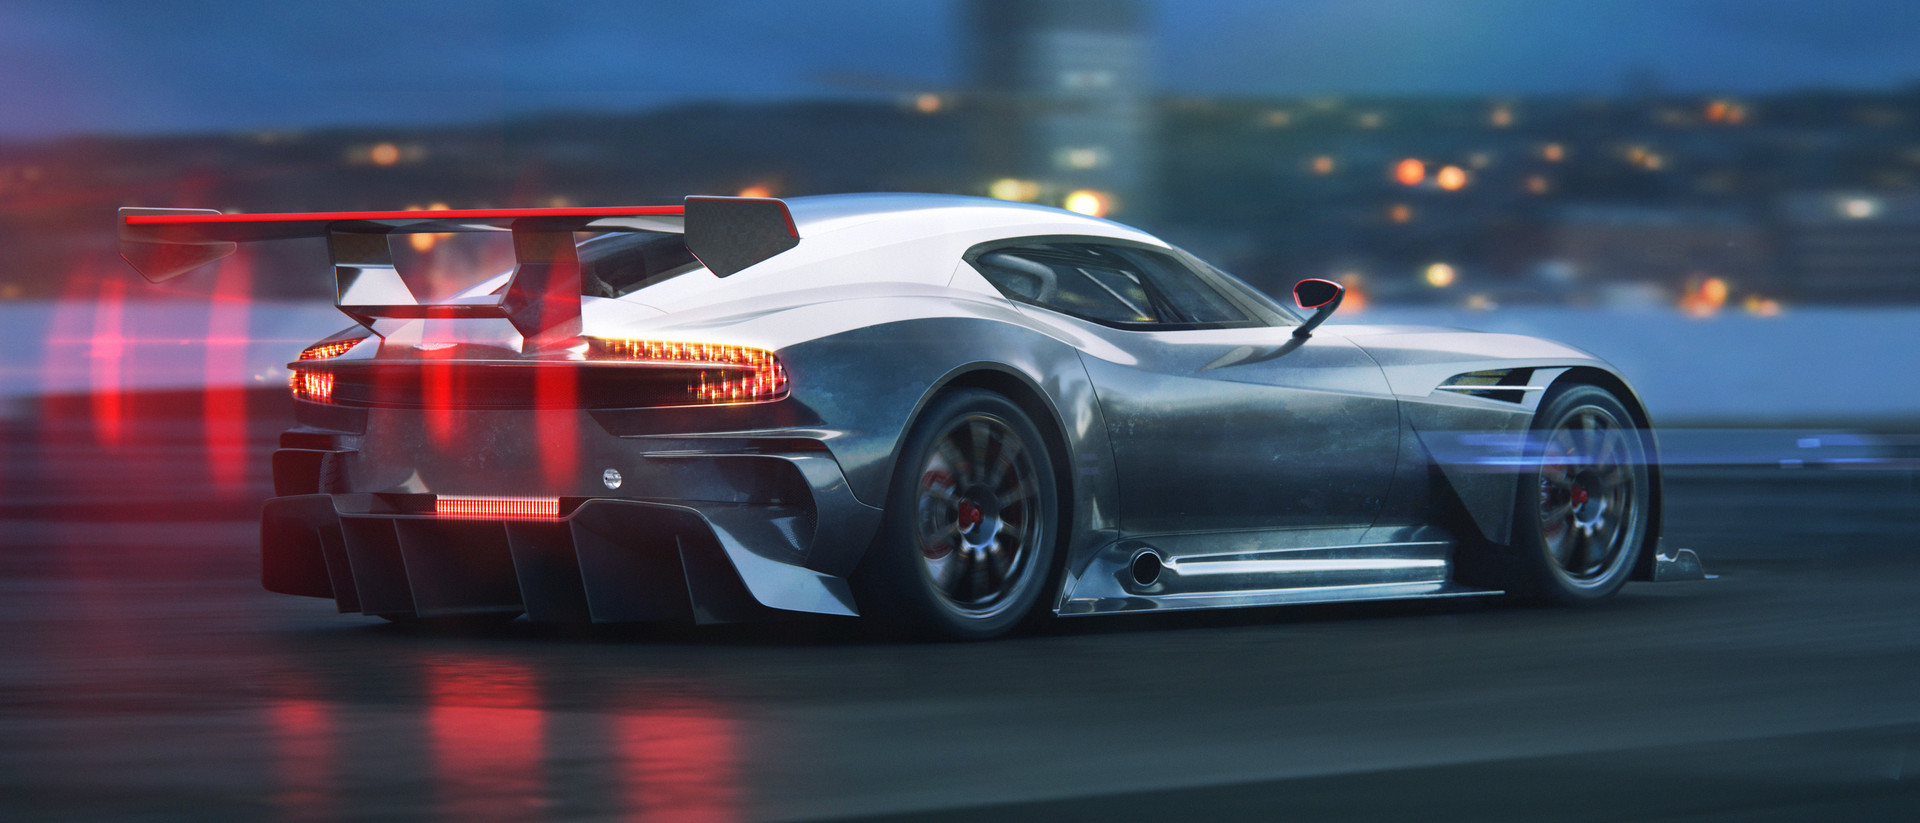 Aston Martin Revisited